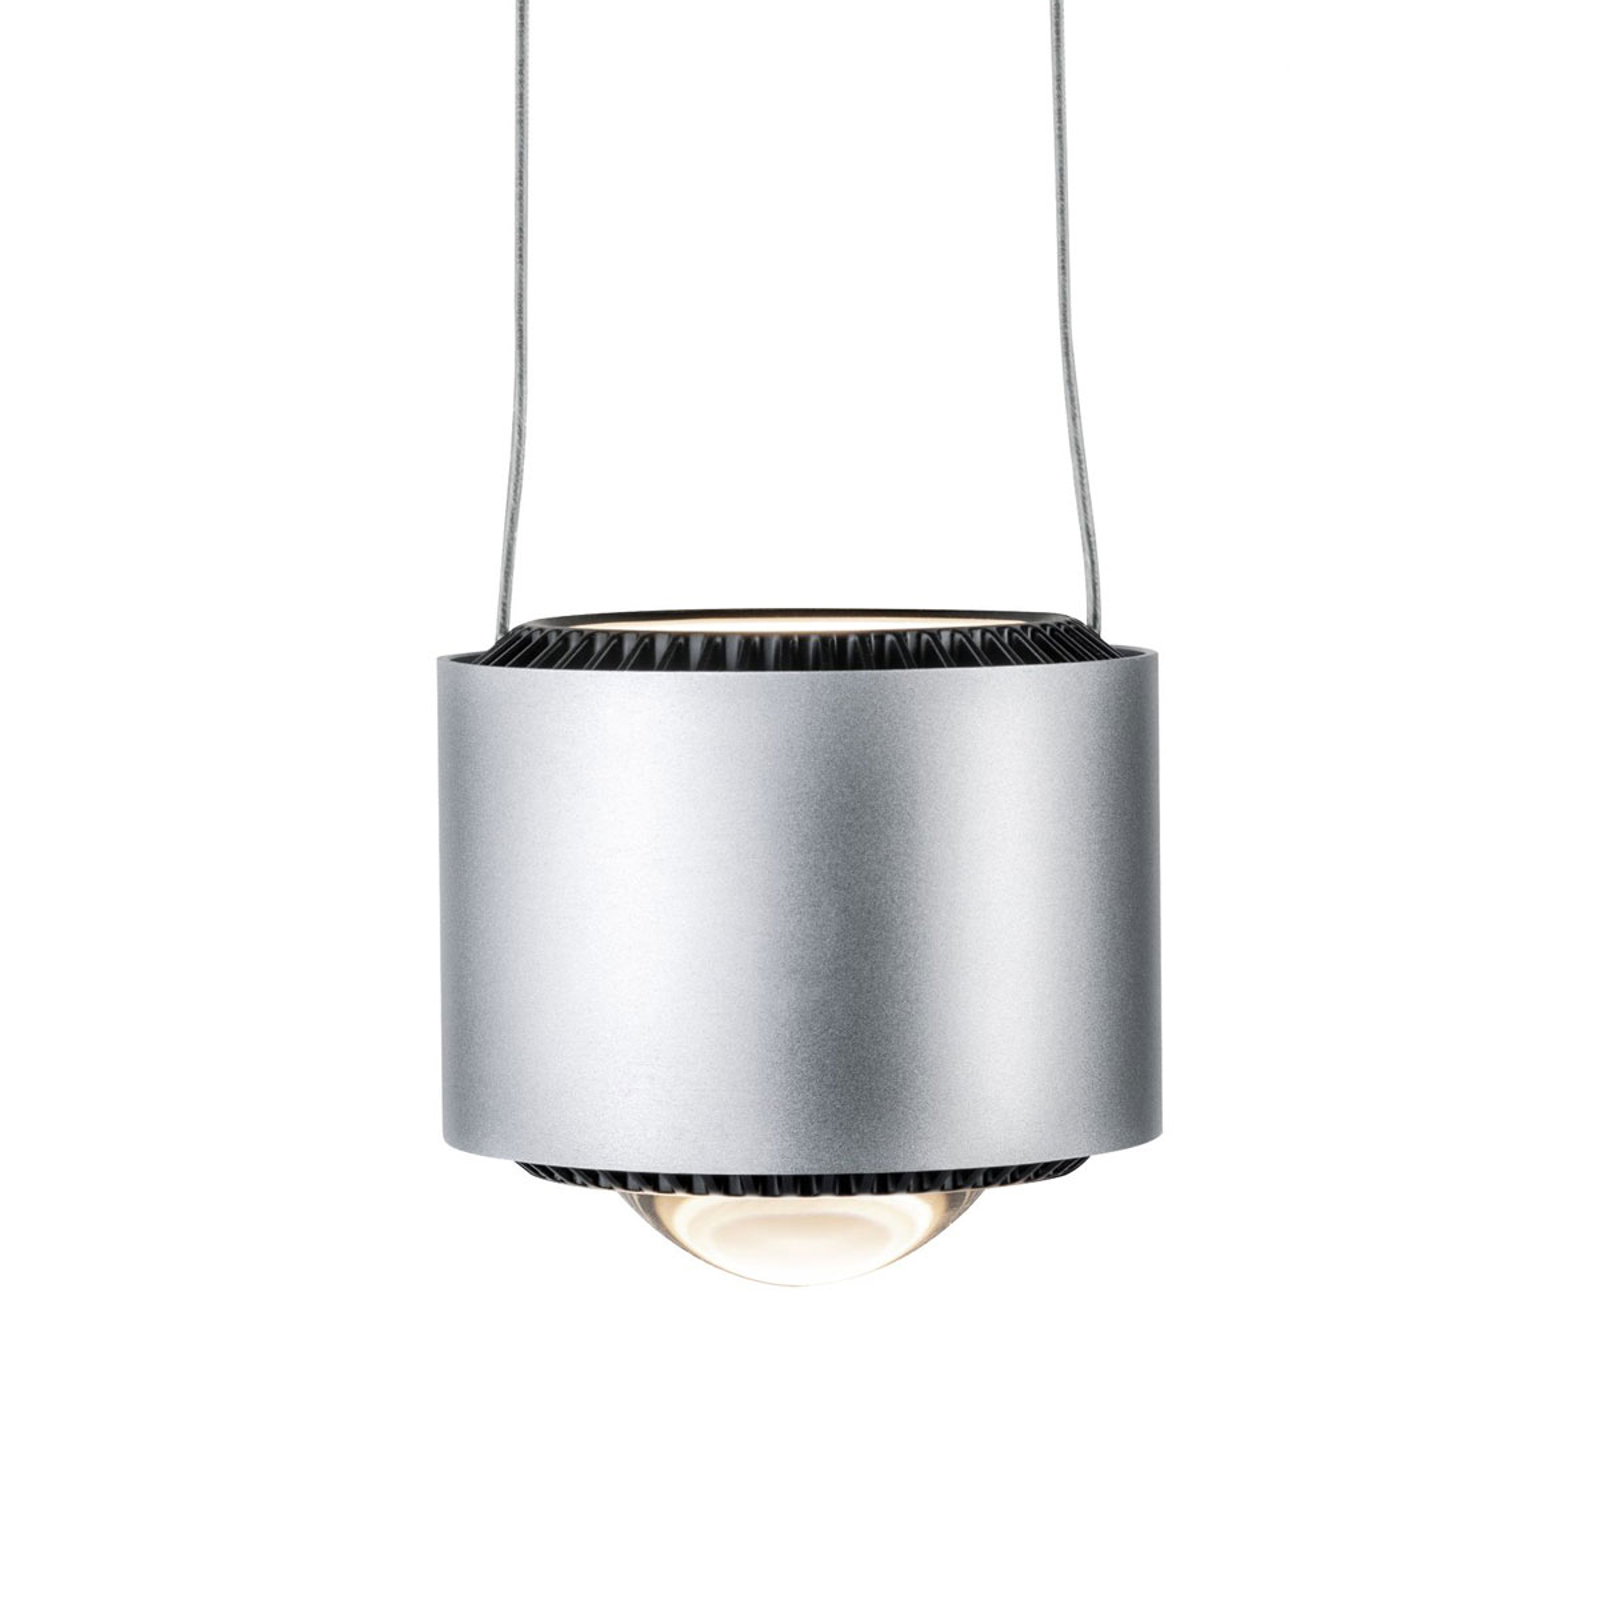 Paulmann LED-Pendelleuchte Aldan URail dimmbar